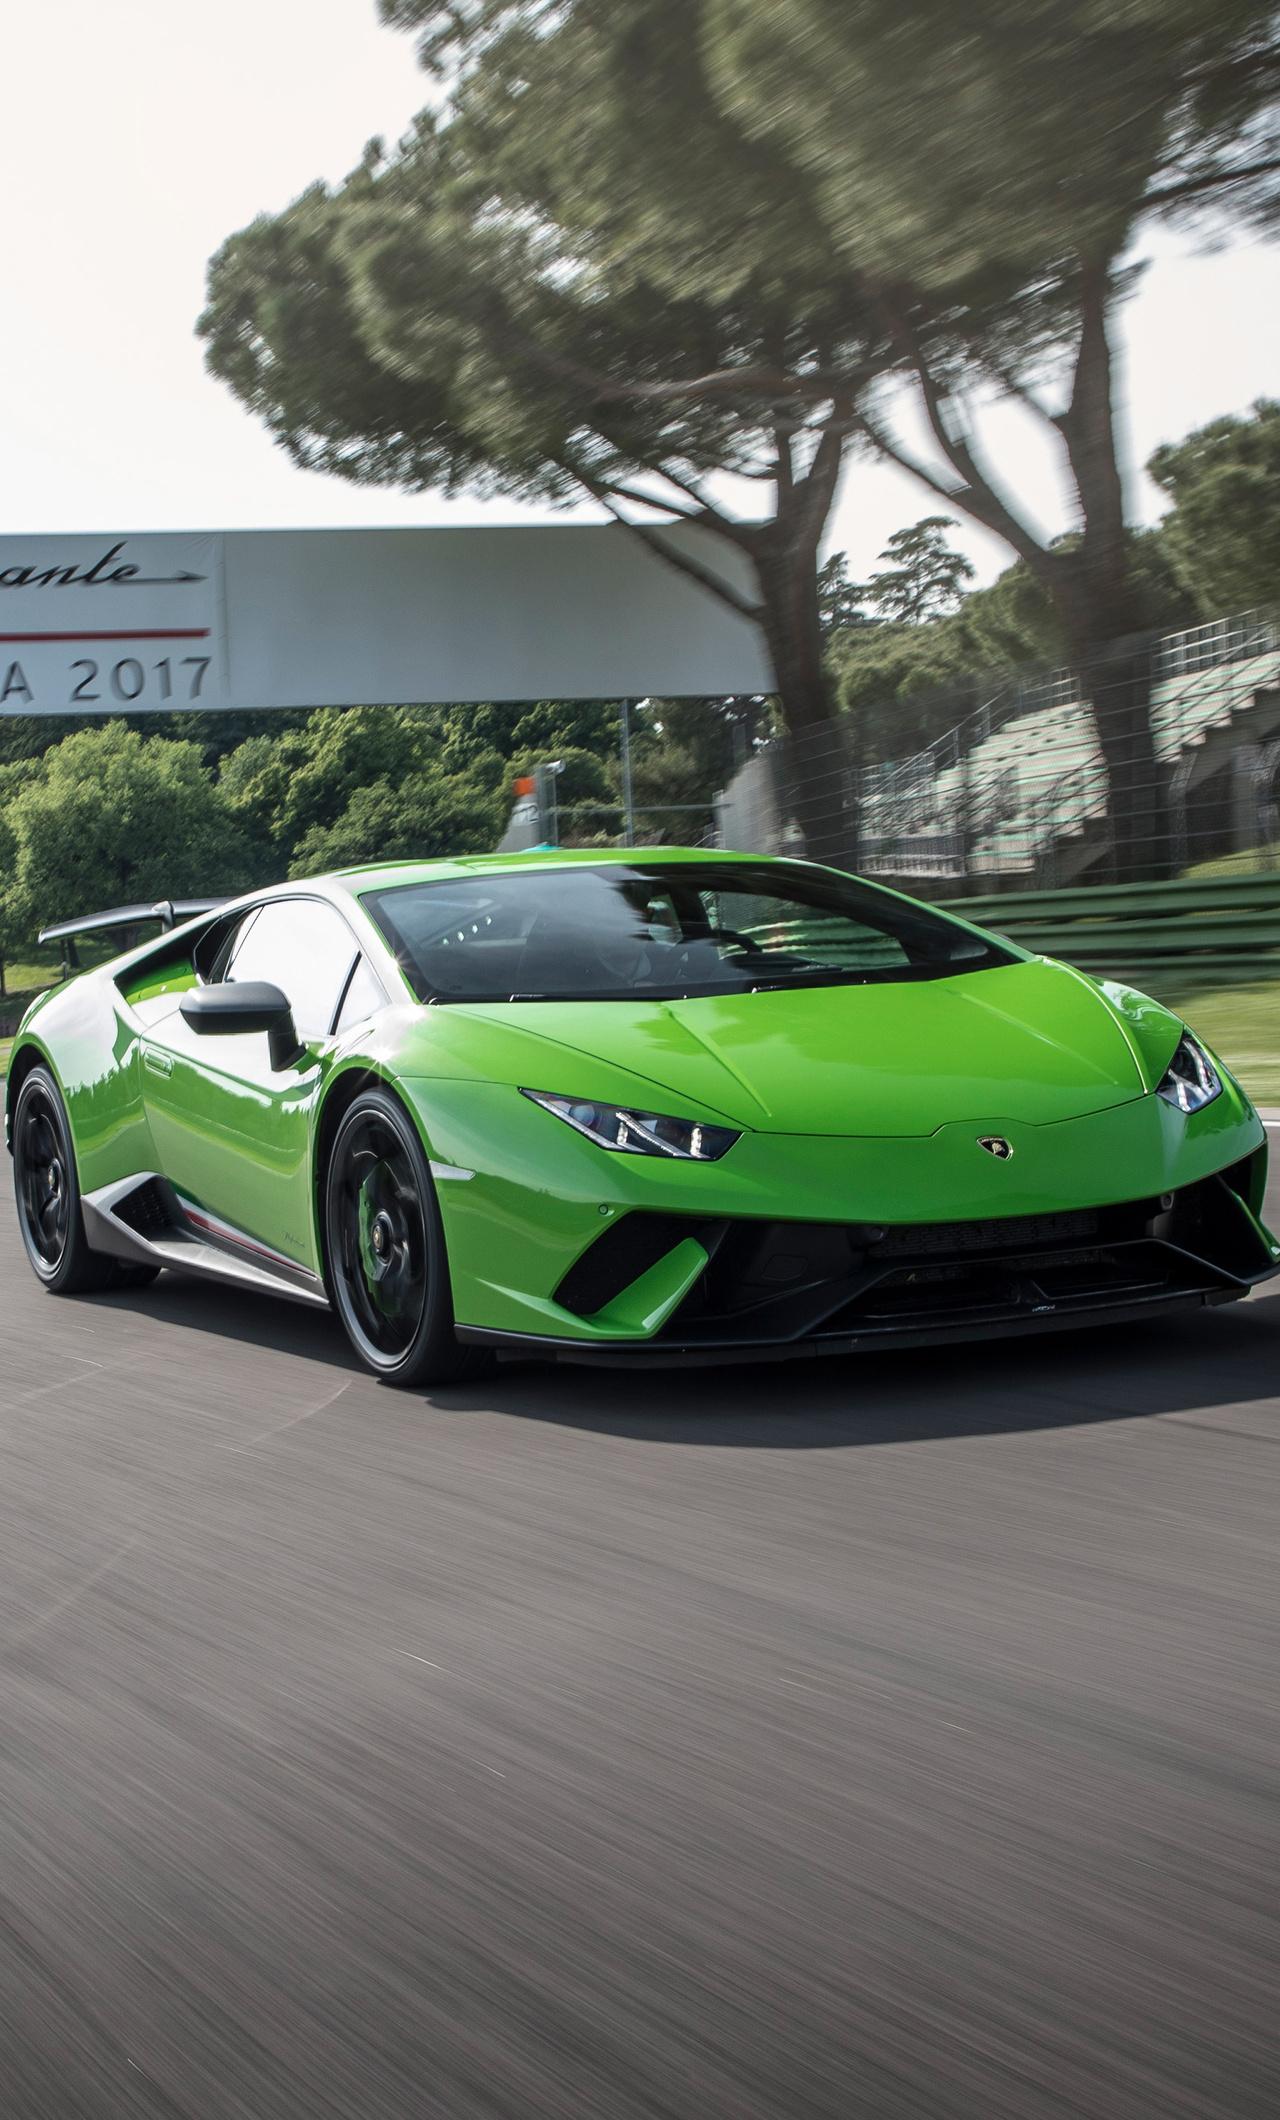 1280x2120 Lamborghini Huracan Performante Super Car Iphone 6 Hd 4k